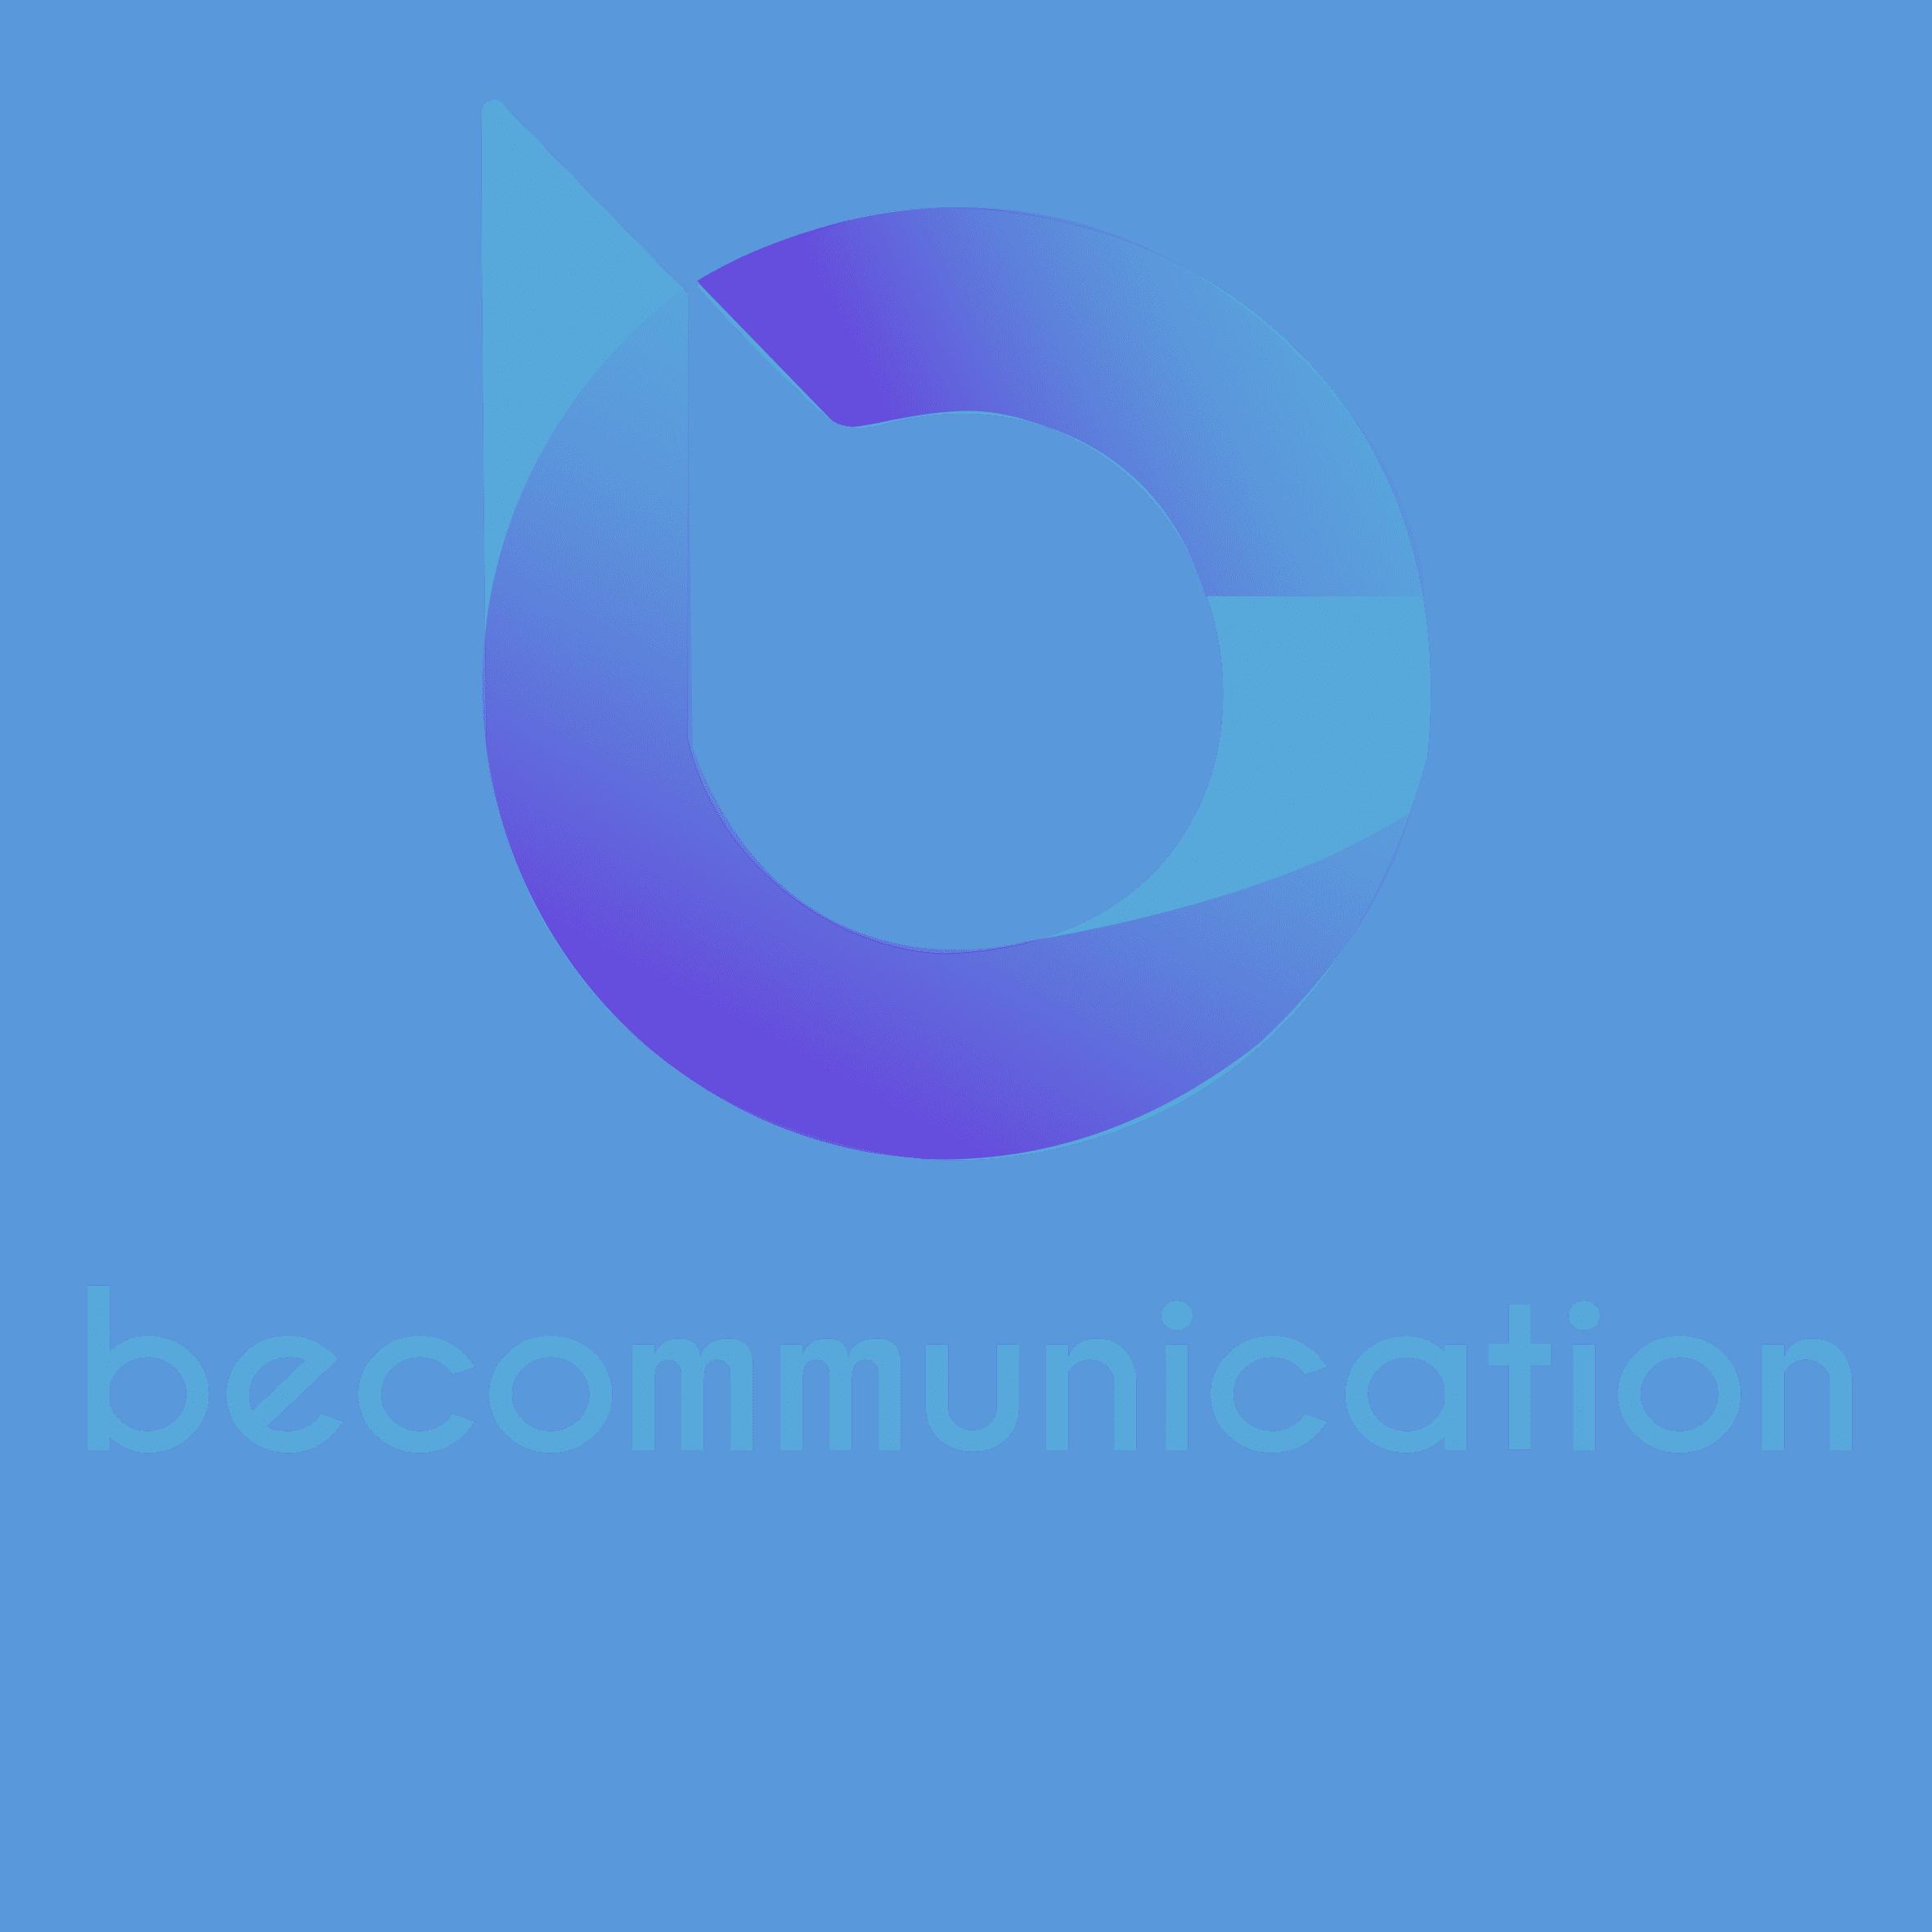 Logo becommunication texte